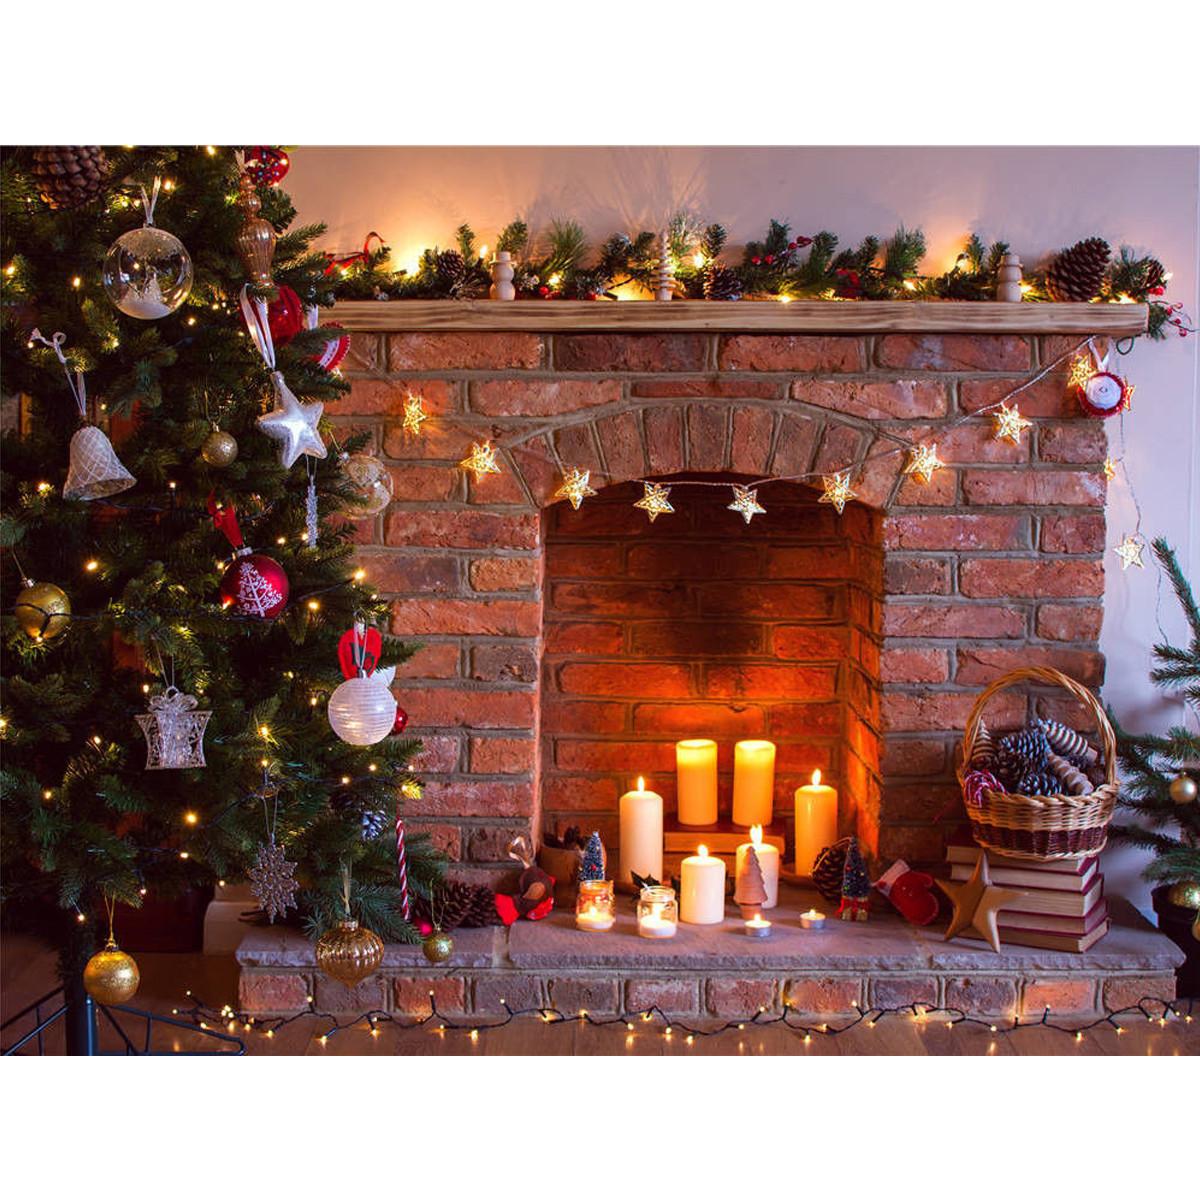 Christmas Tree By Fireplace  7x5FT Vinyl Retro Christmas Tree Fireplace graphy